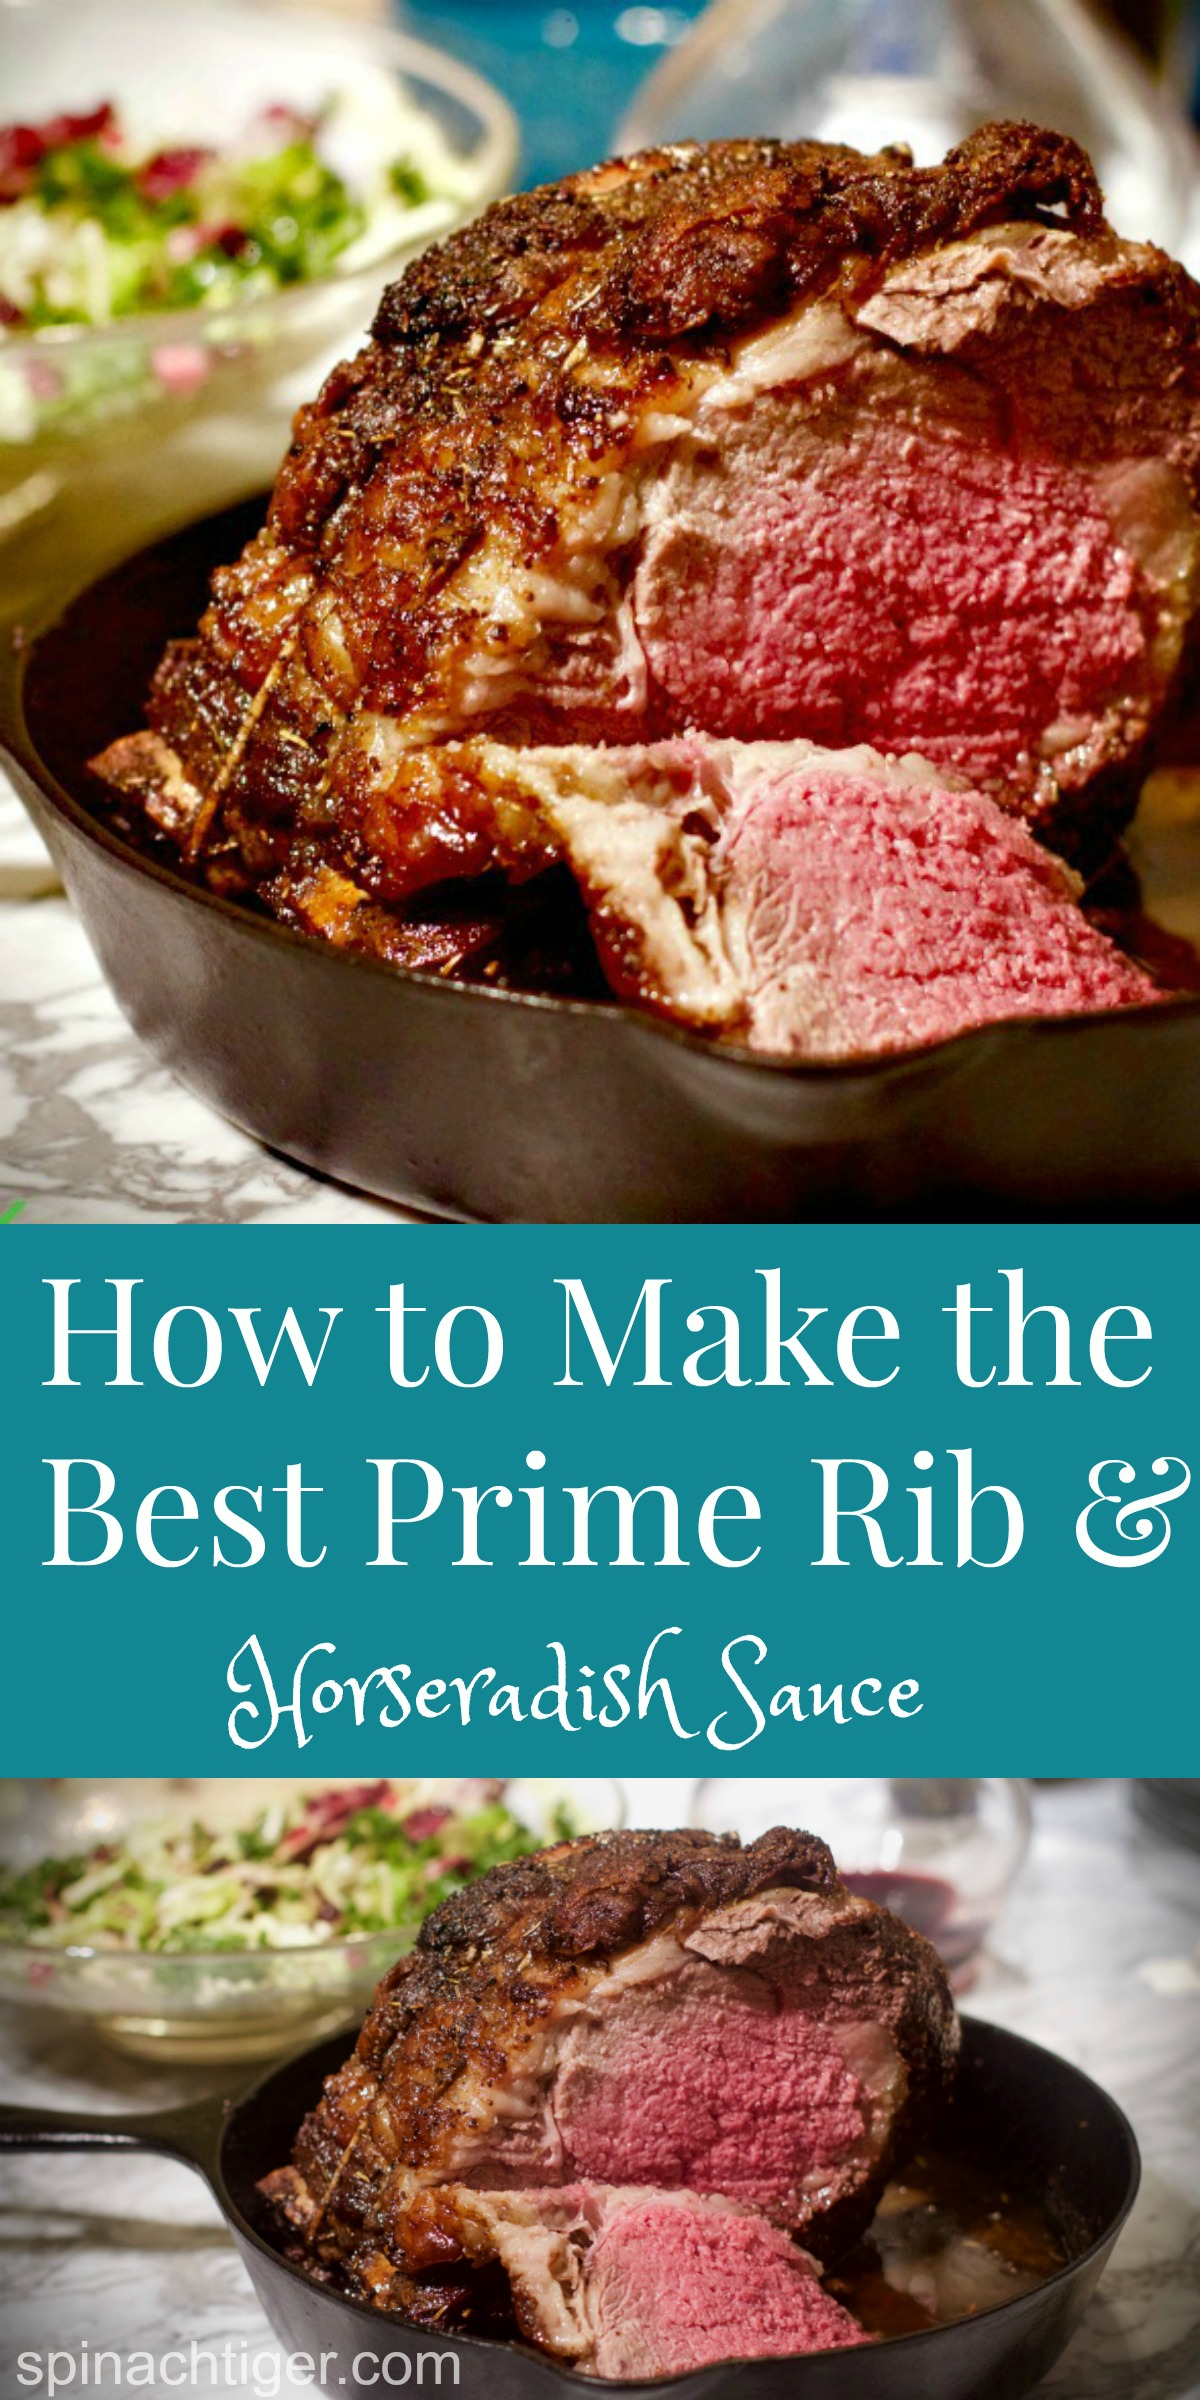 Make the best Prime rib in 2 1/2 hours. First, Dry age in your refrigerator for 7 days. Make Horseradish sauce. #primerib #spinachtiger #dryagemeat #primeribeofbeef #christmasdinner via @angelaroberts